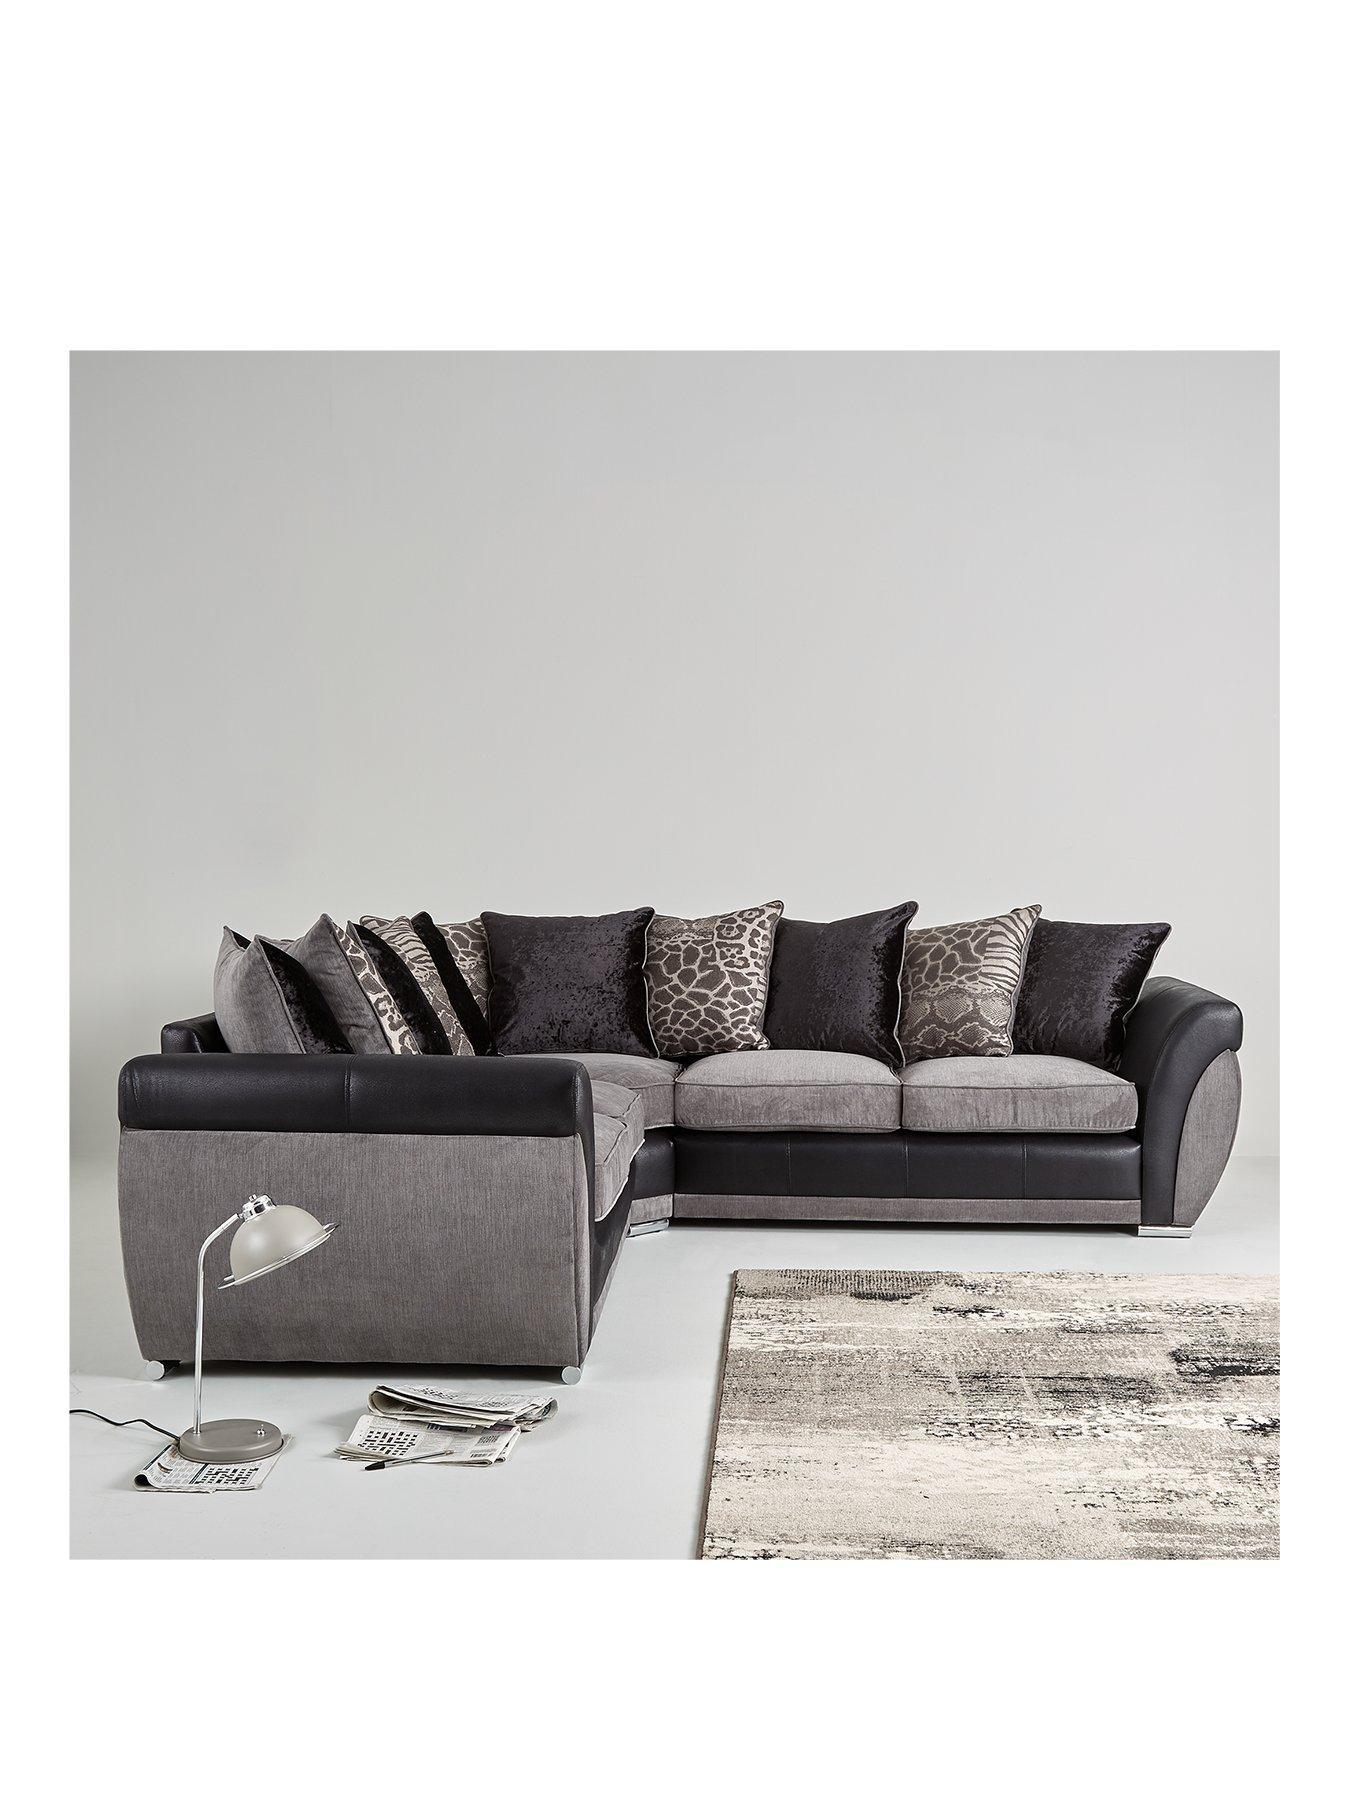 Fabric Sofas | 2,3,4,5 Seater Fabric Sofas | Very.co.uk